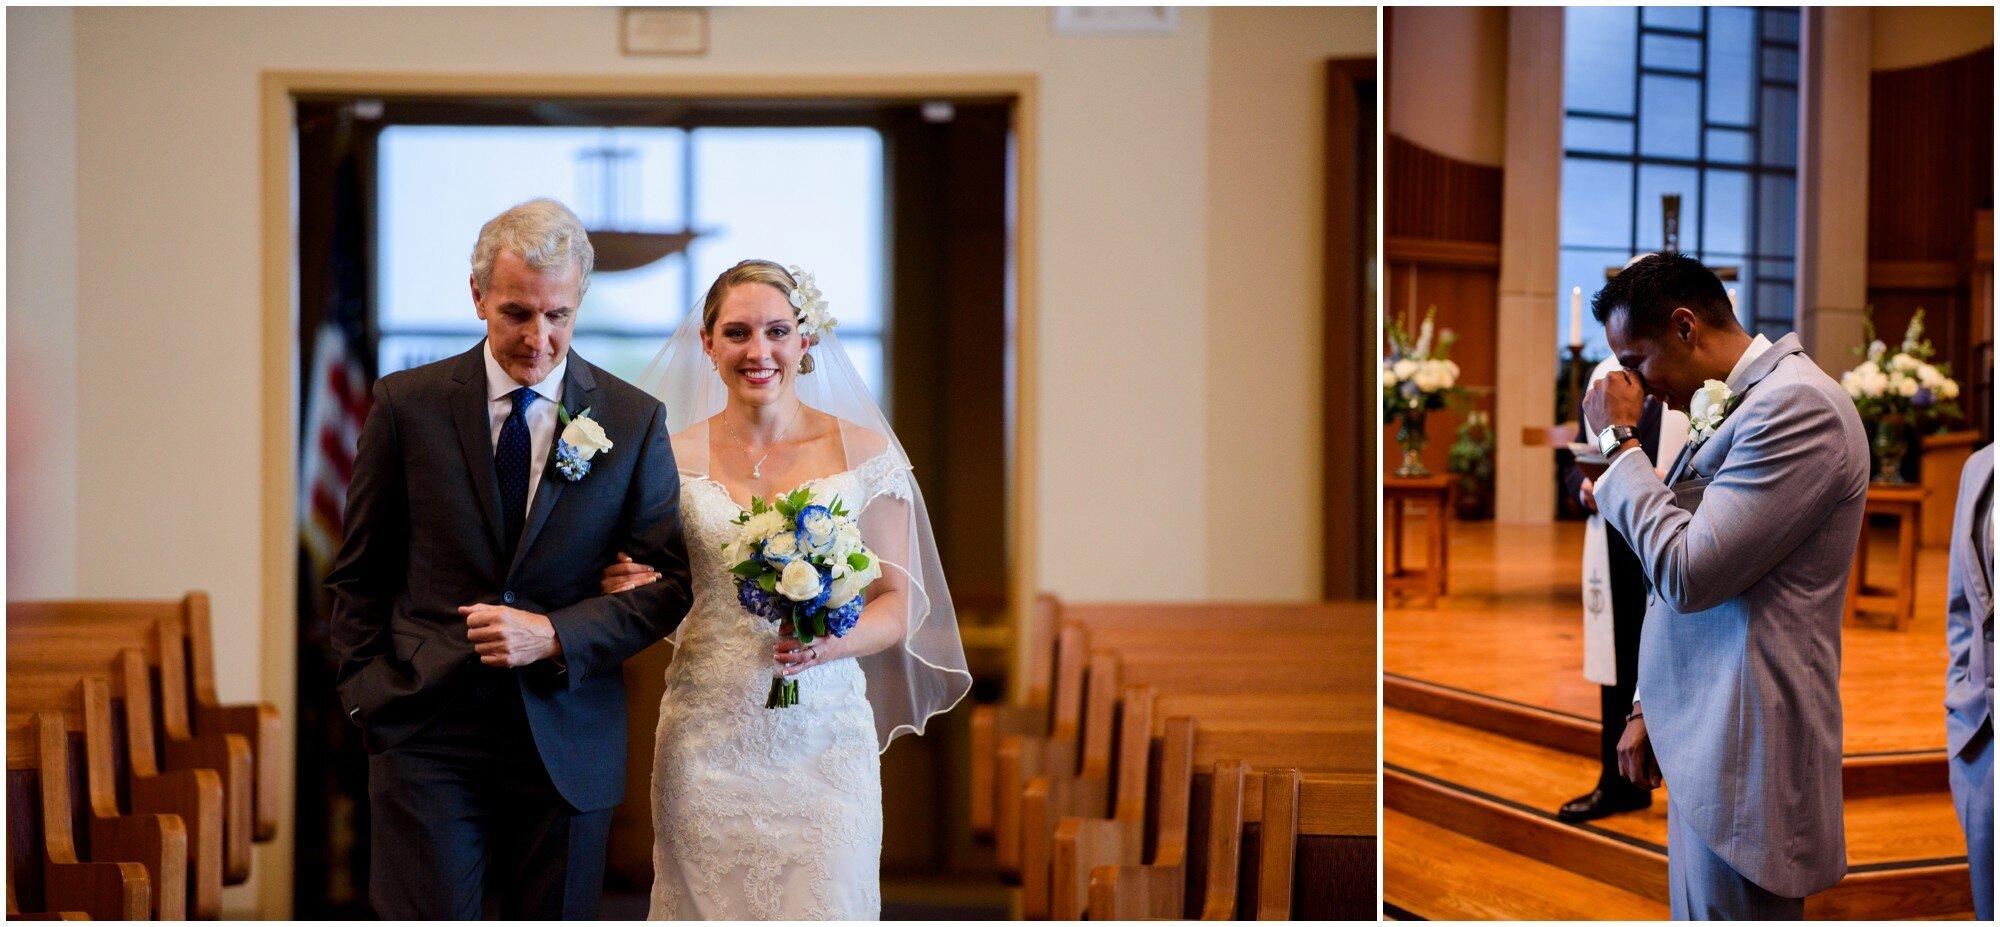 groom sees his bride walking down aisle in highlands ranch colorado